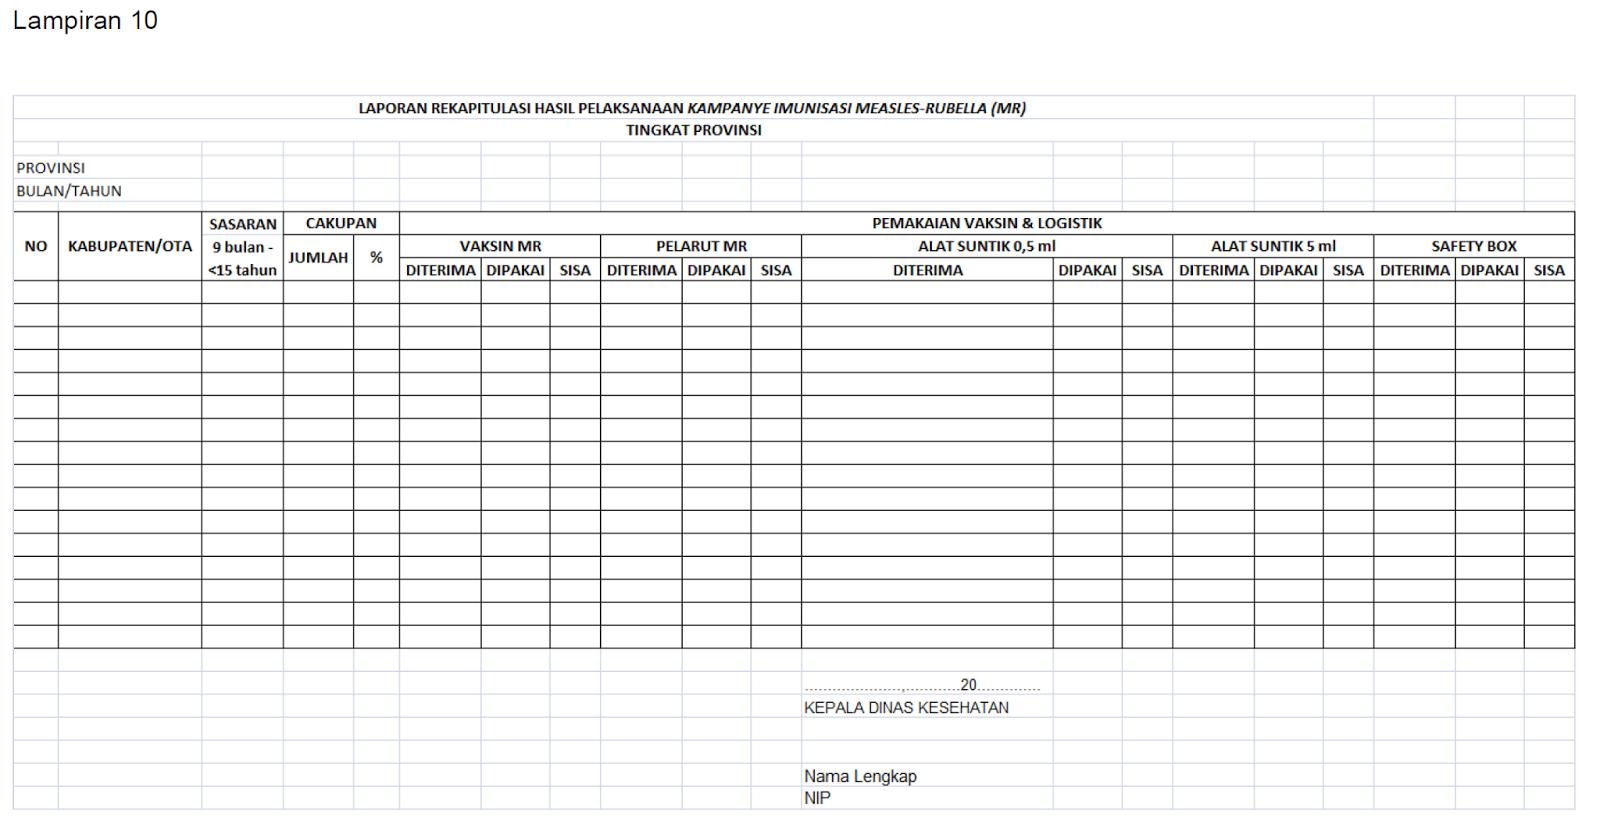 Laporan rekapitulasi hasil pelaksanaan kampanye imunisasi measles-Rubella (MR) tingkat provinsi, dinas kesehatan, cakupan, sasaran jumlah vaksin pelarut alat suntuk diterima dipakai sisa, tabel kolom isian